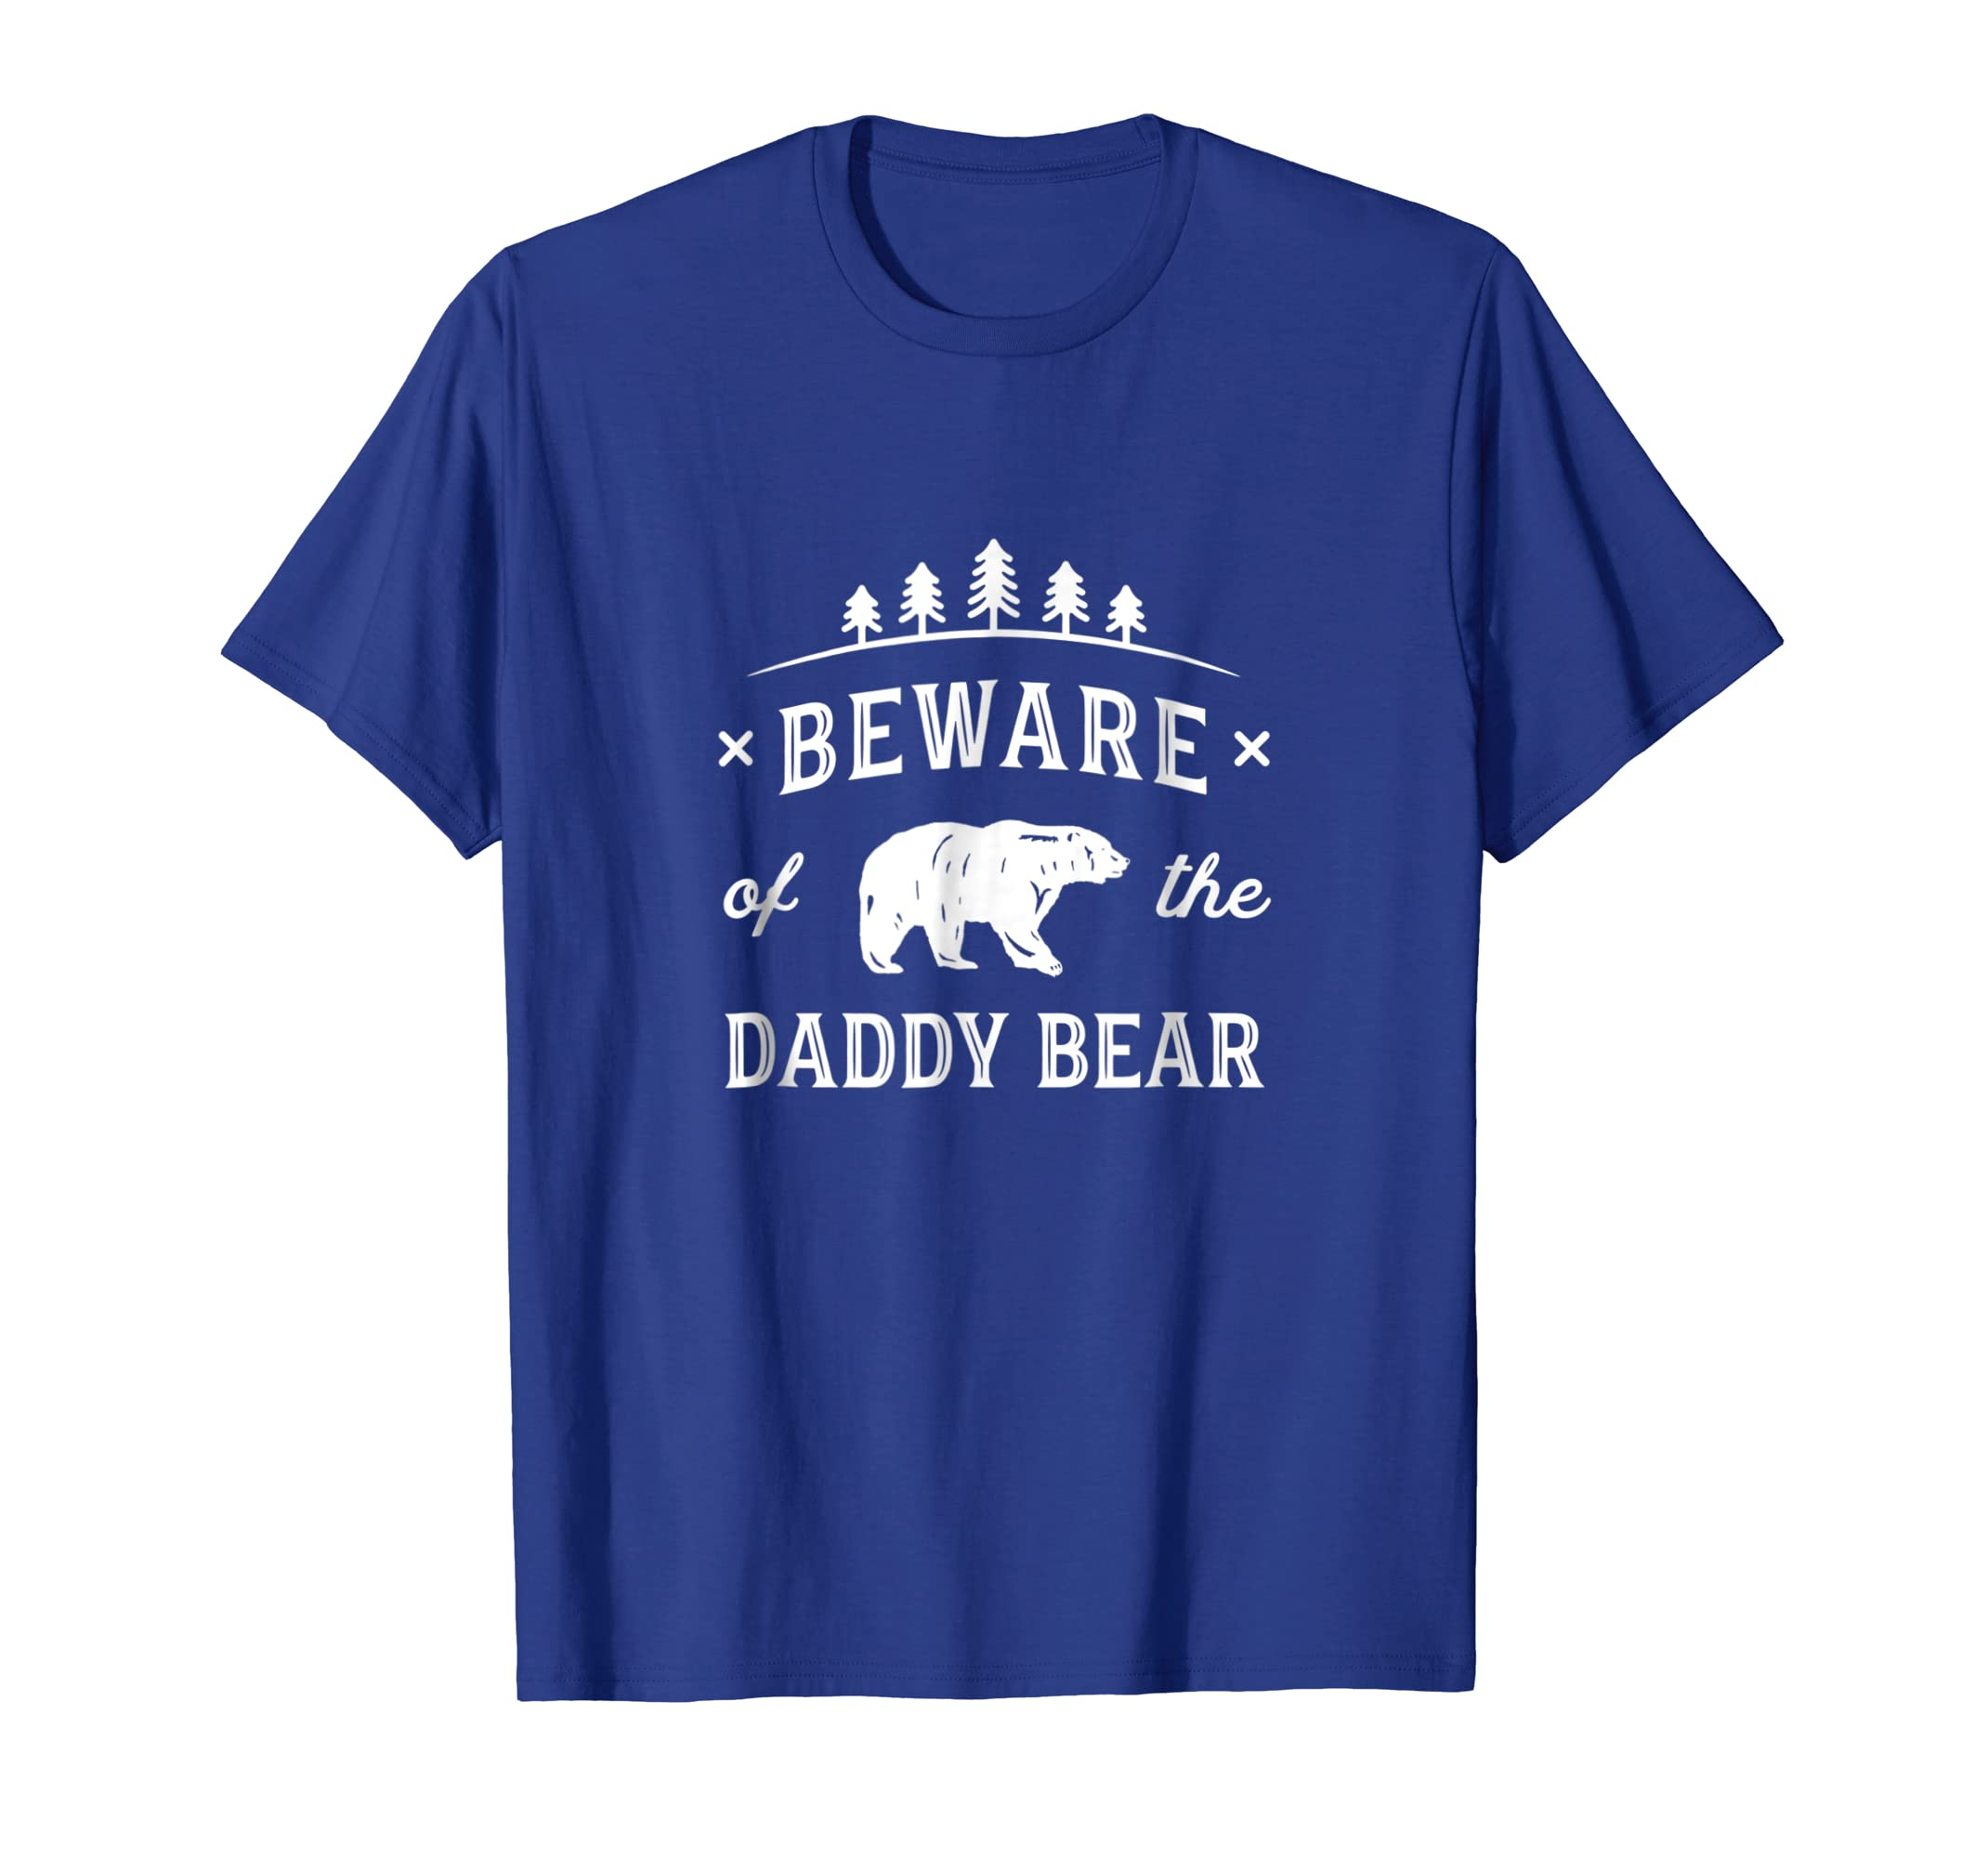 Mens Fathers Day Shirt Beware Daddy Bear Trees Tshirt Gift Dads-Teehay